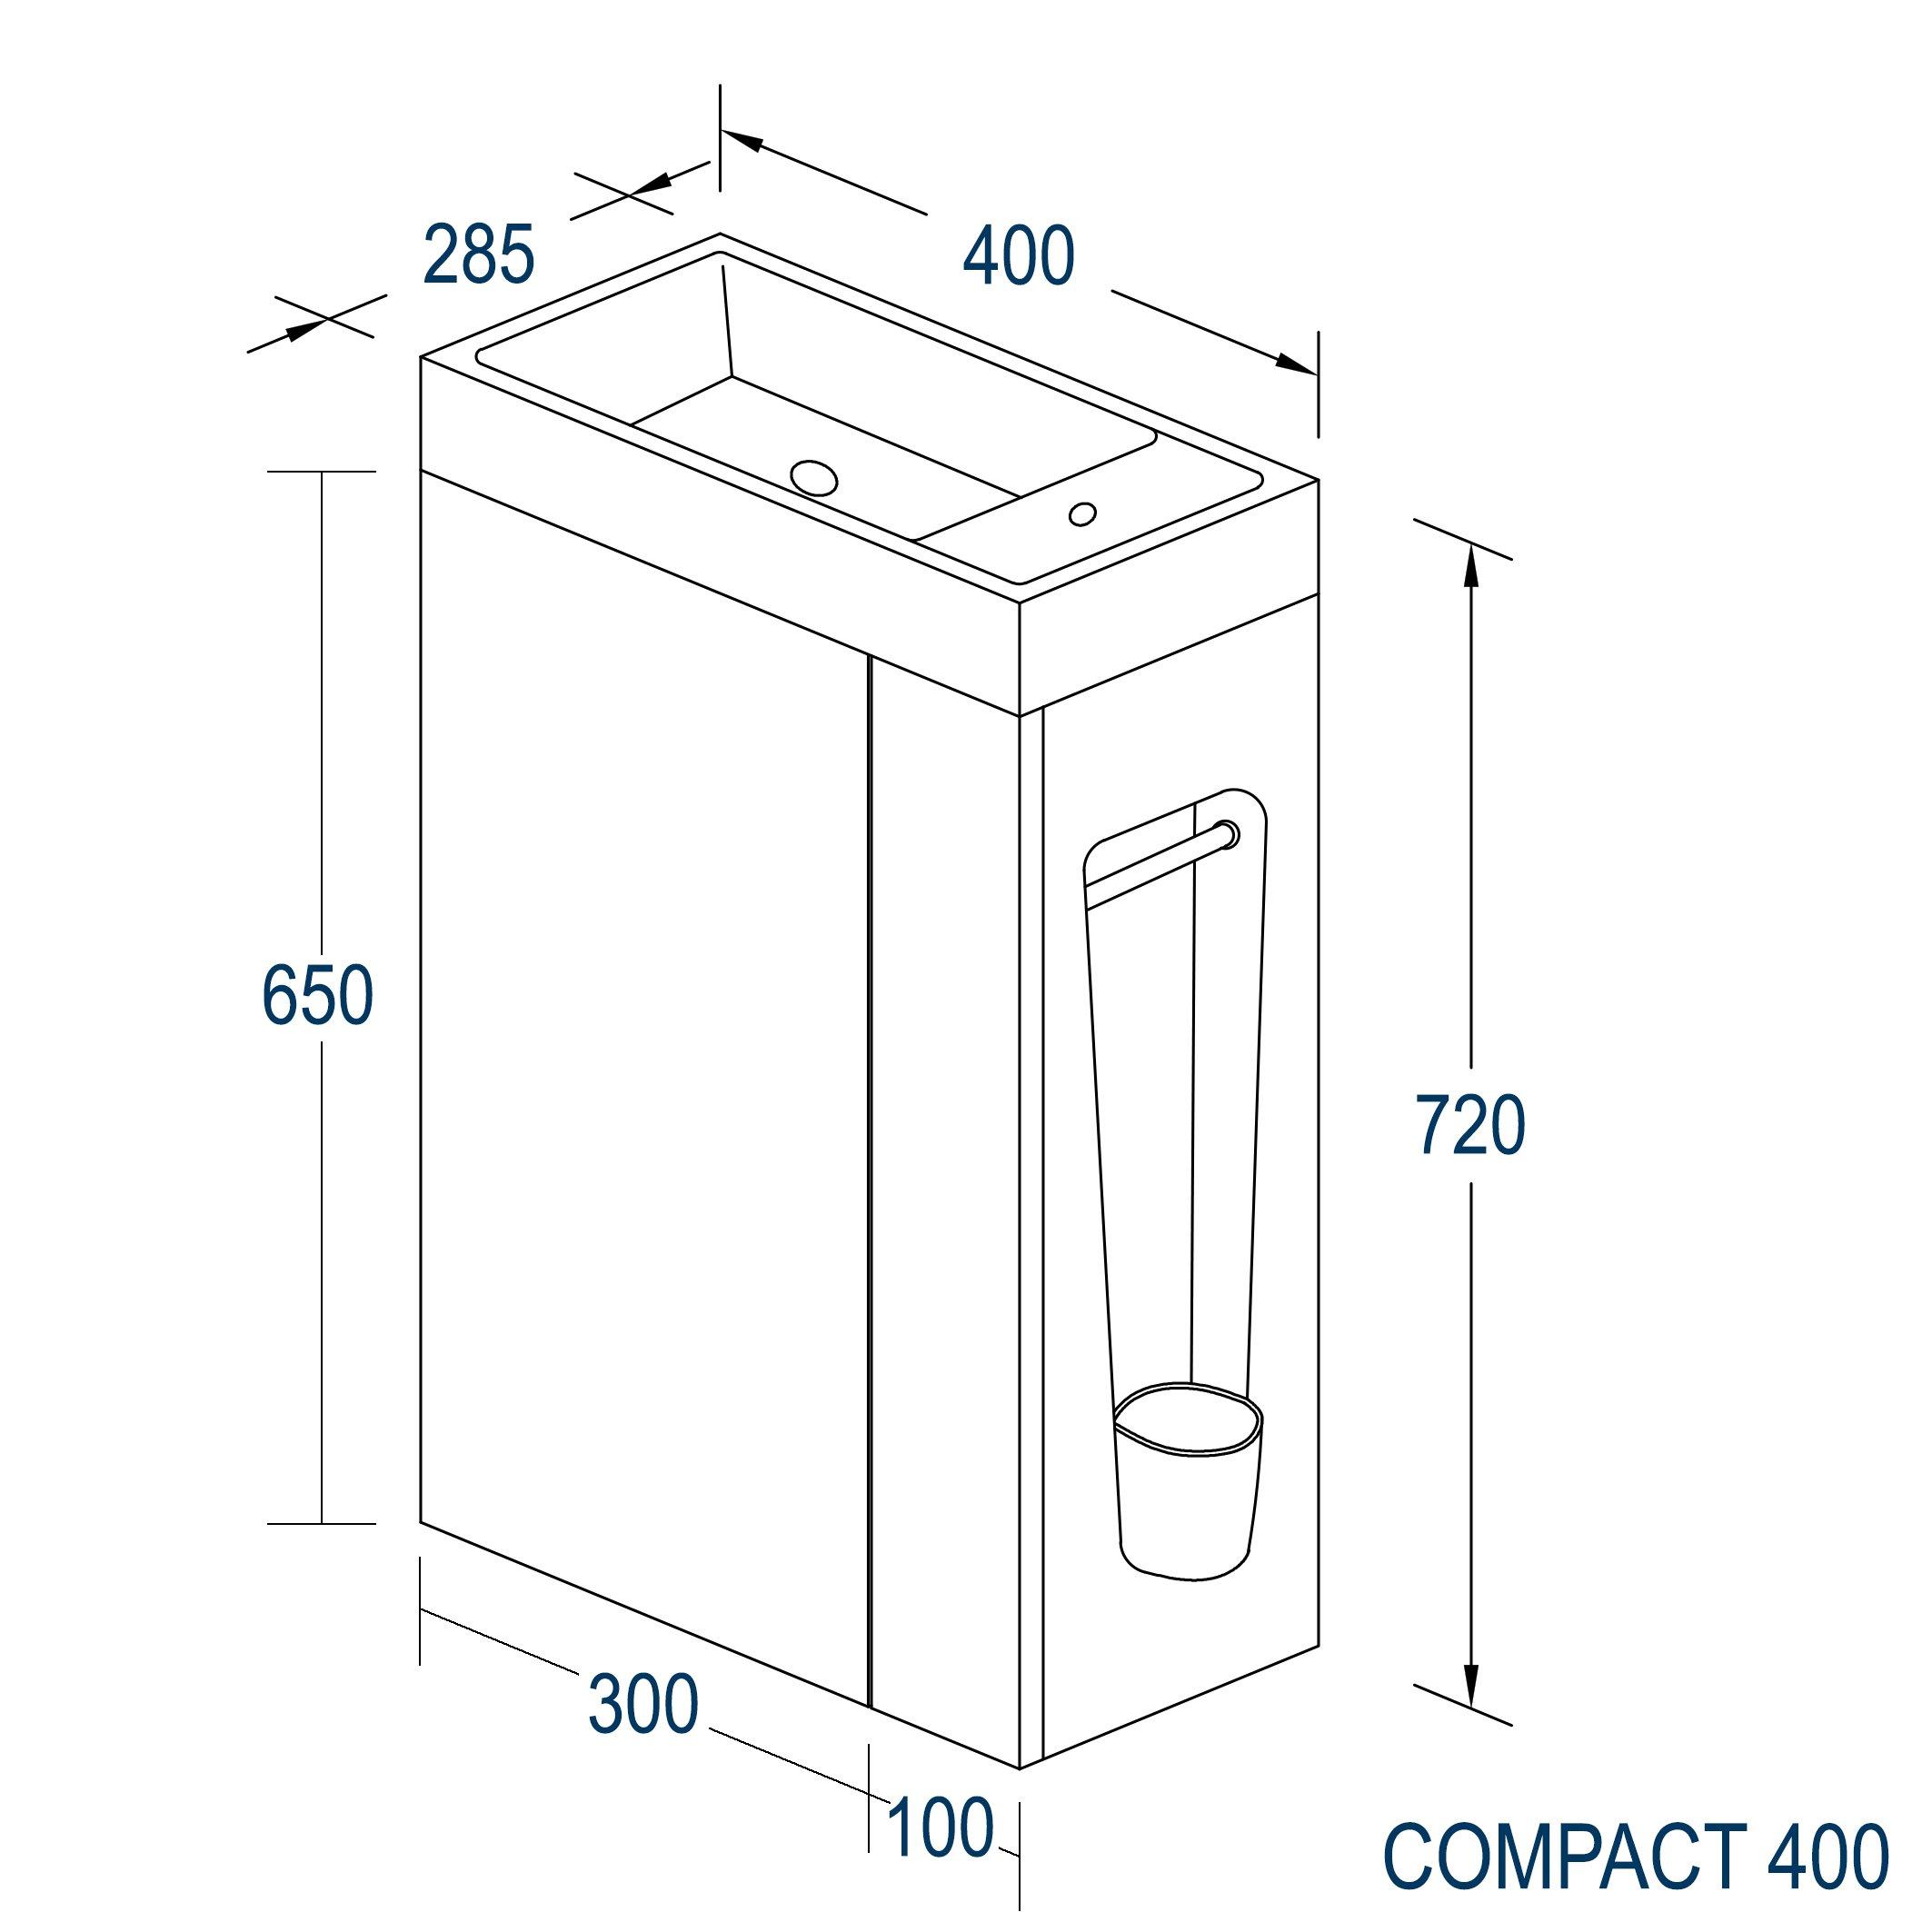 Badmöbel-Set Compact 400 für Gäste-WC - Taupe hell matt zoom thumbnail 6